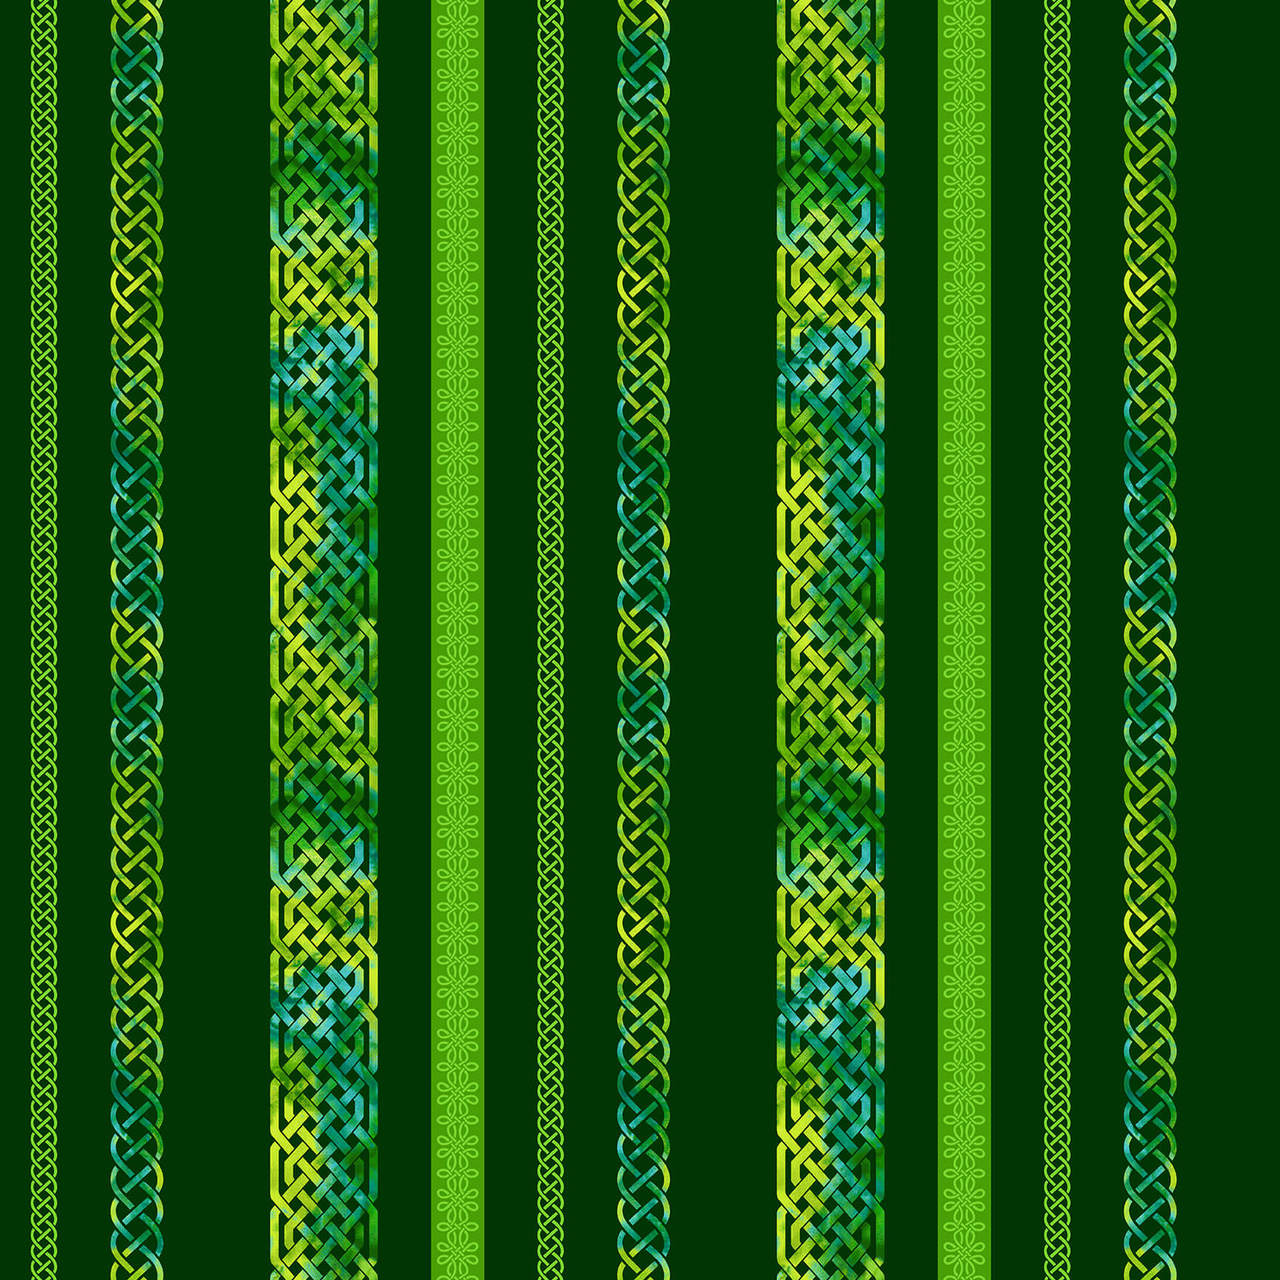 2403-68 Emerald